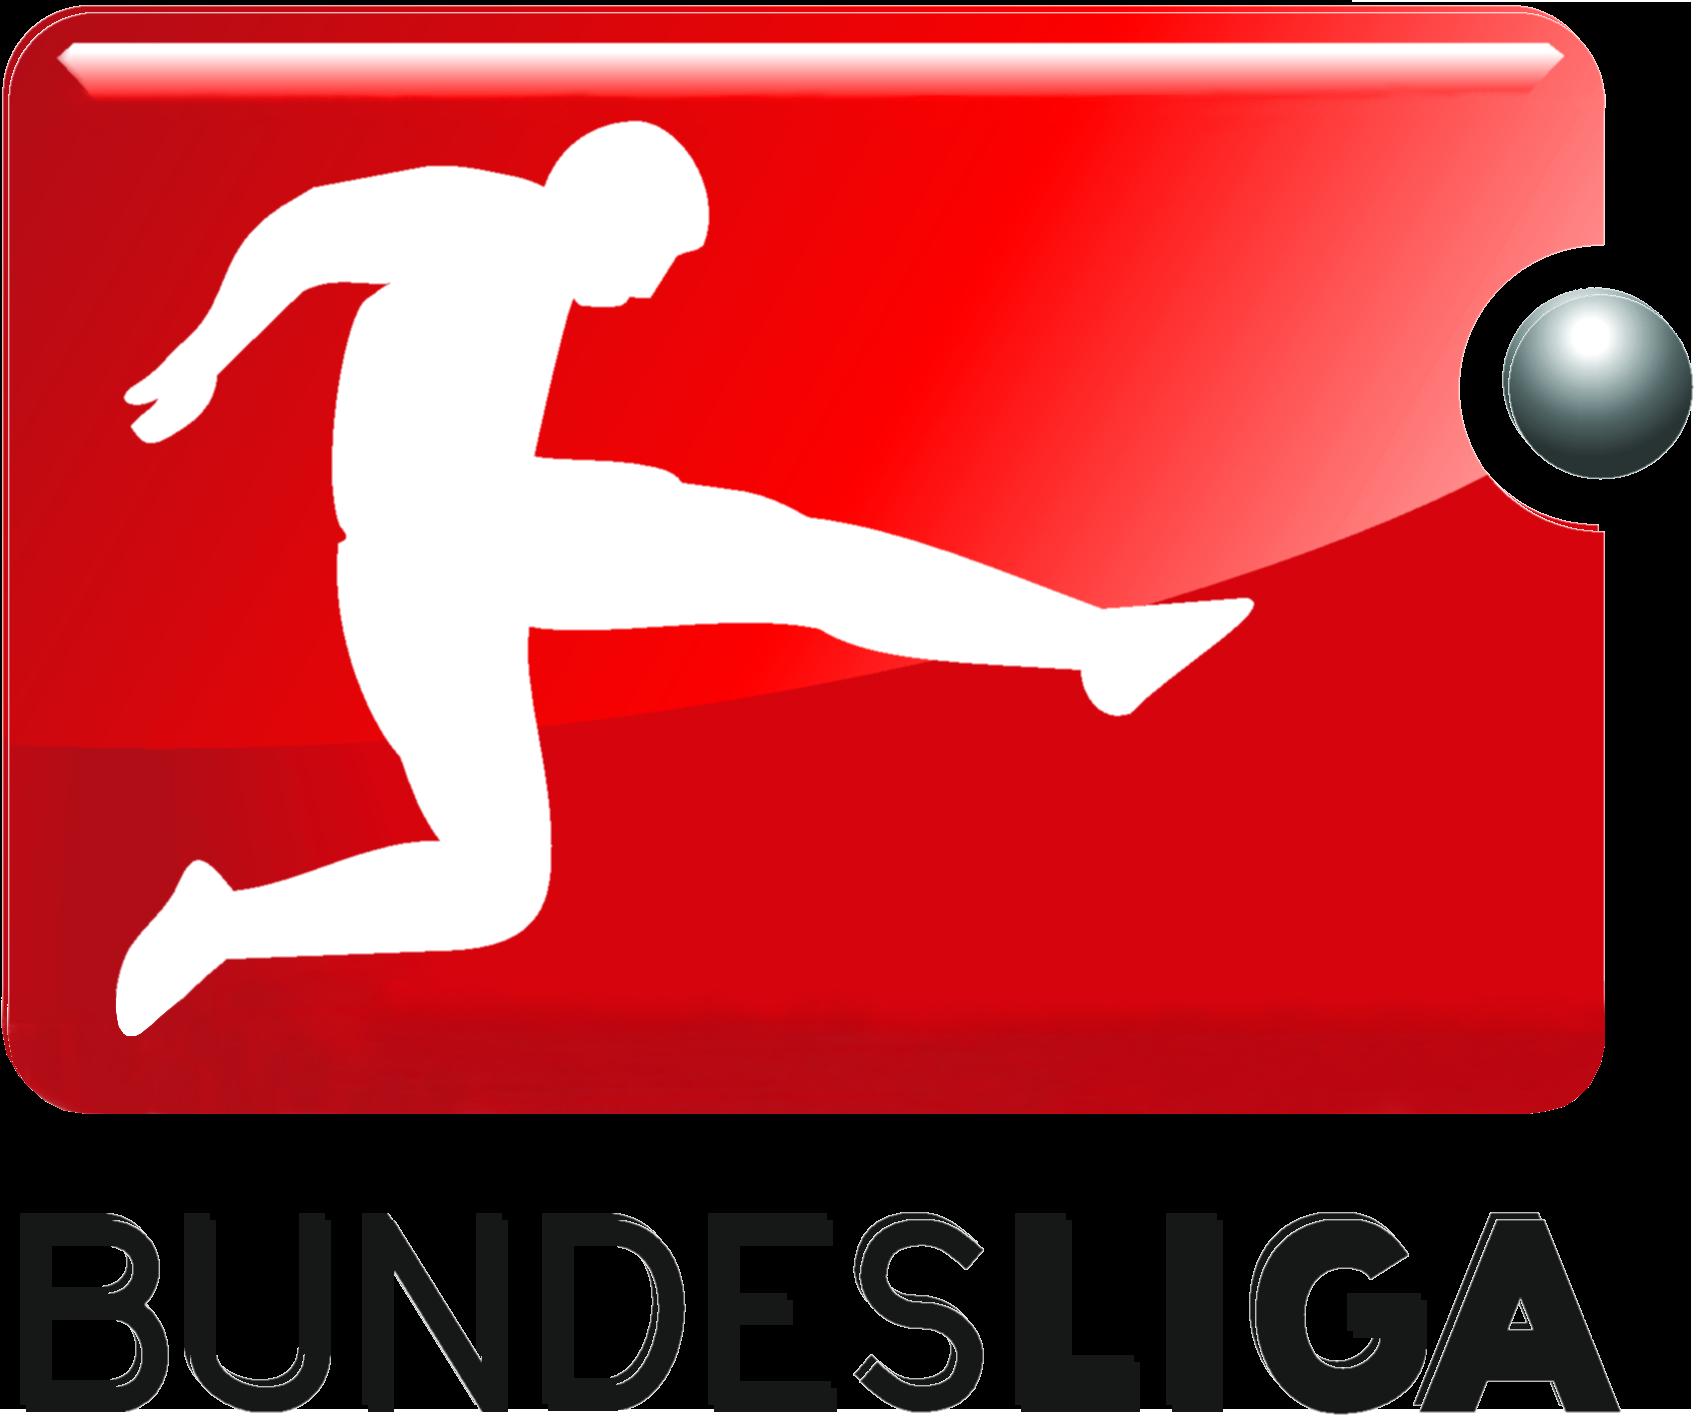 2 Fussball Bundesliga Wikipedia Bahasa Indonesia Ensiklopedia Bebas